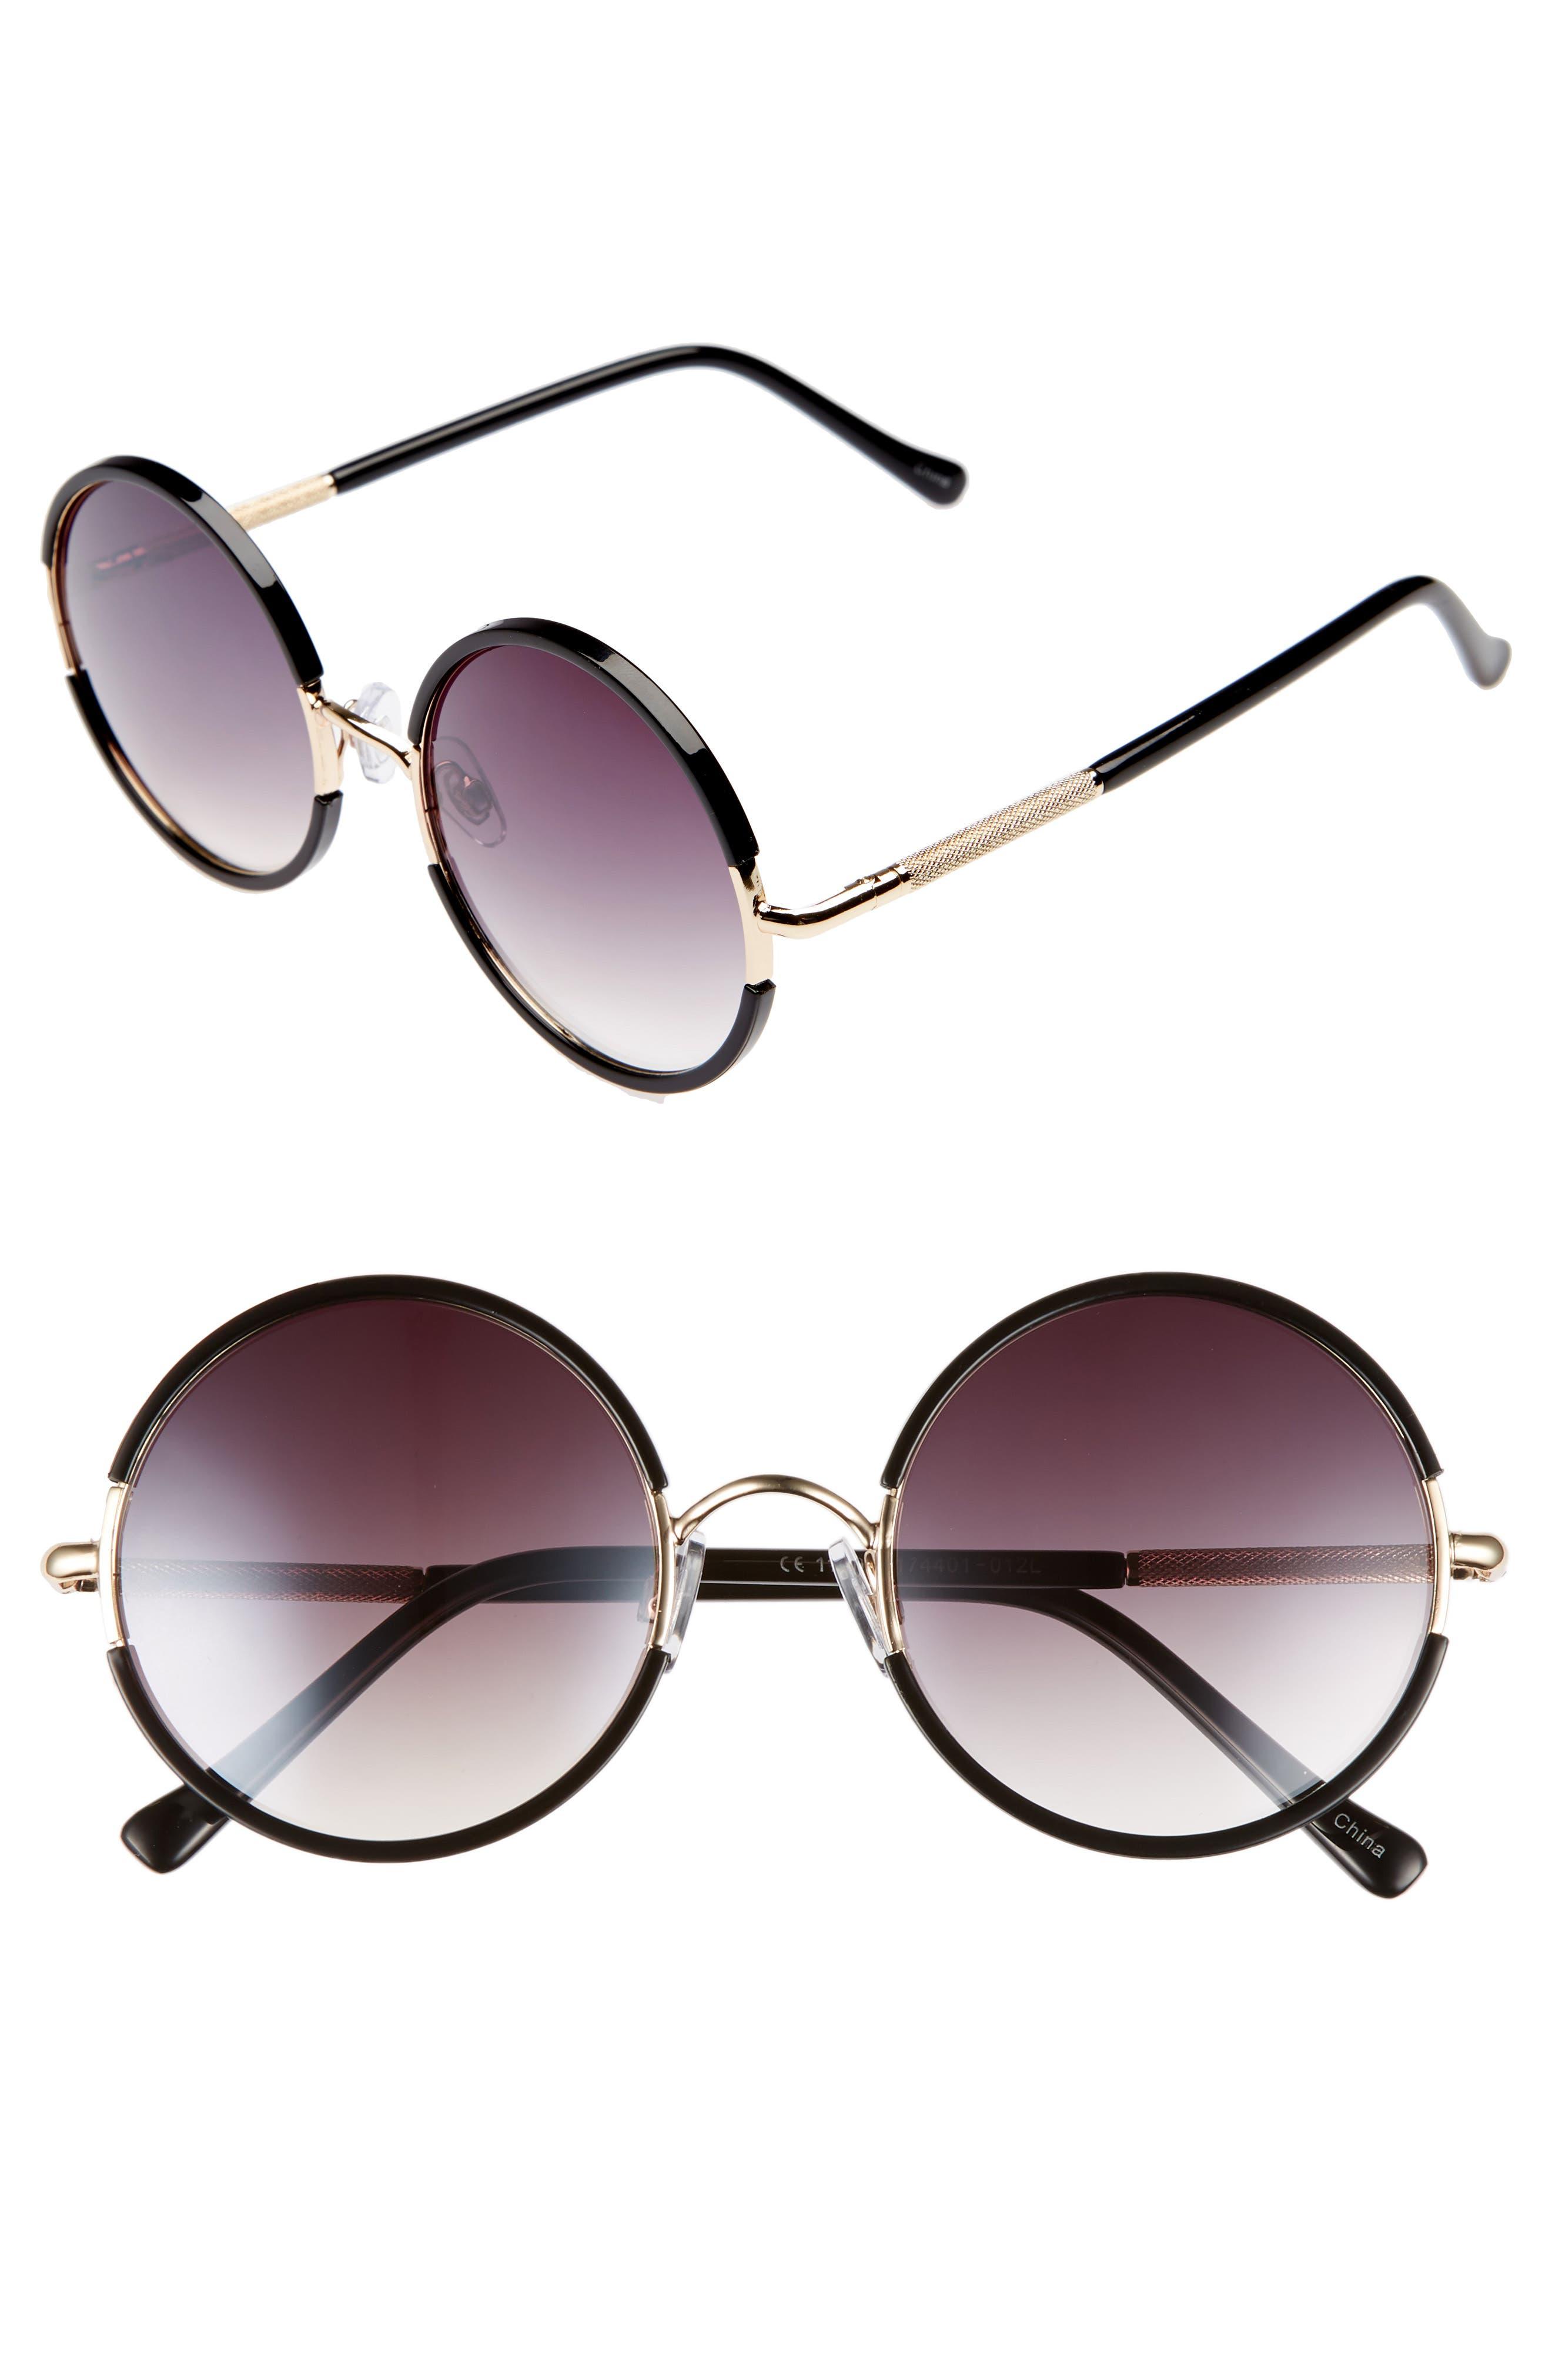 52mm Gradient Round Sunglasses,                             Main thumbnail 1, color,                             Black/ Gold